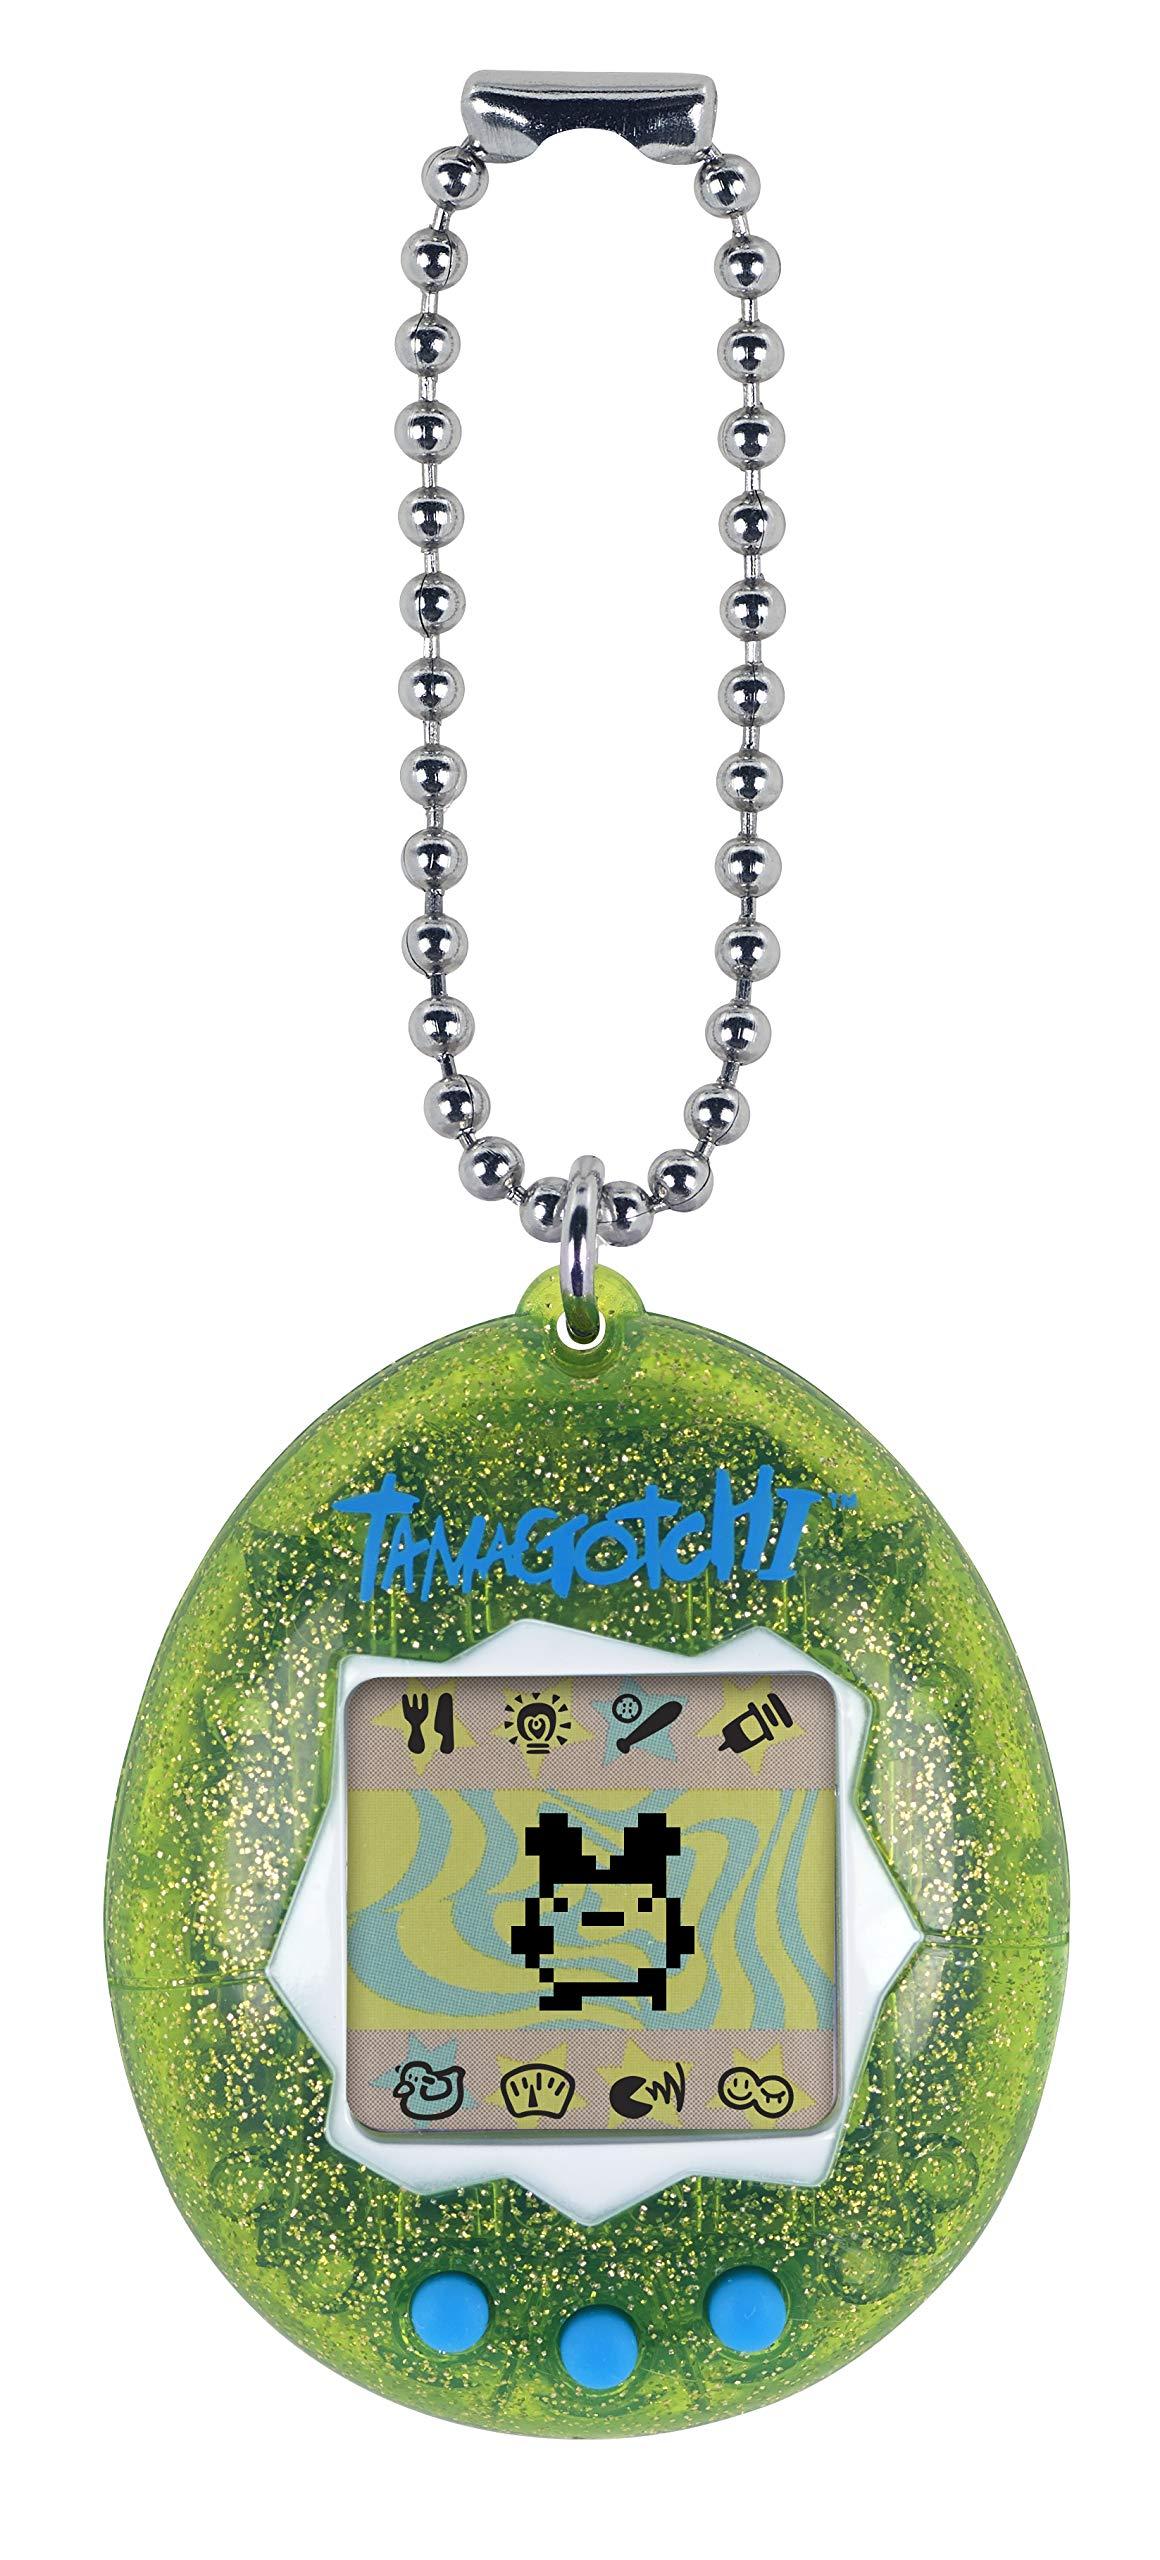 Tamagotchi Electronic Game, Green Glitter by Tamagotchi (Image #1)